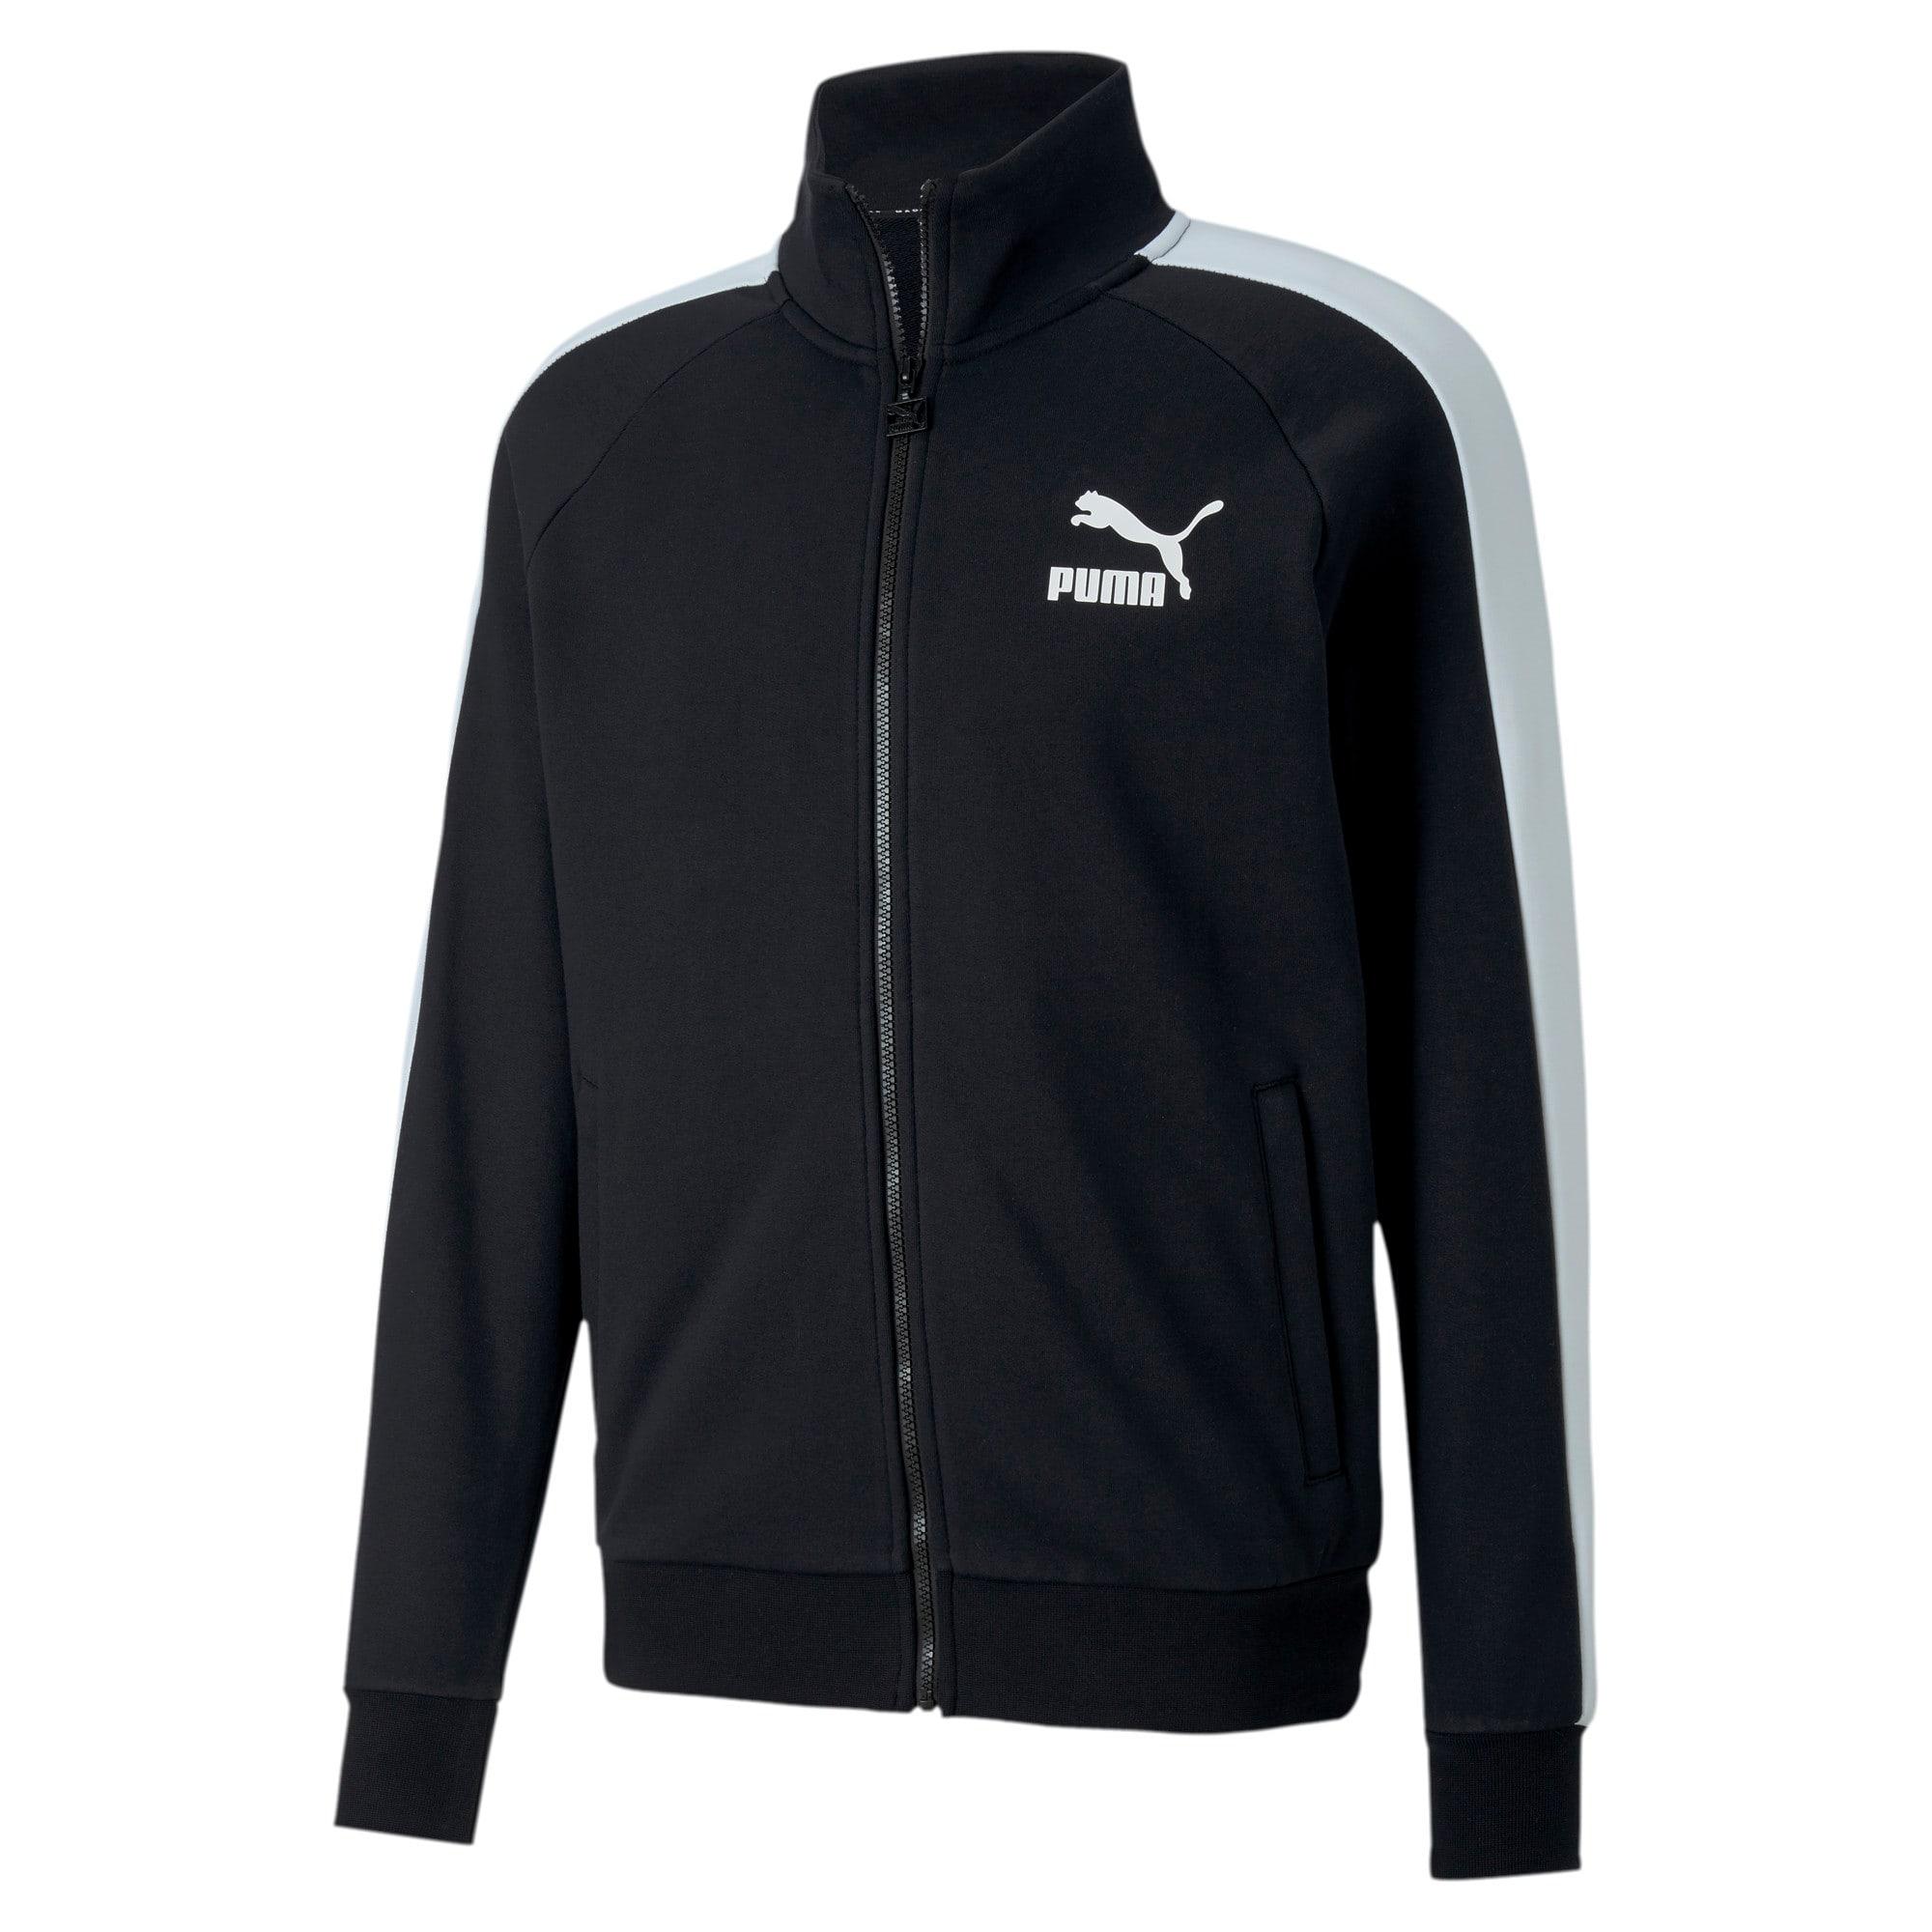 Miniatura 4 de Chaqueta deportiva Iconic T7 para hombre, Puma Black, mediano